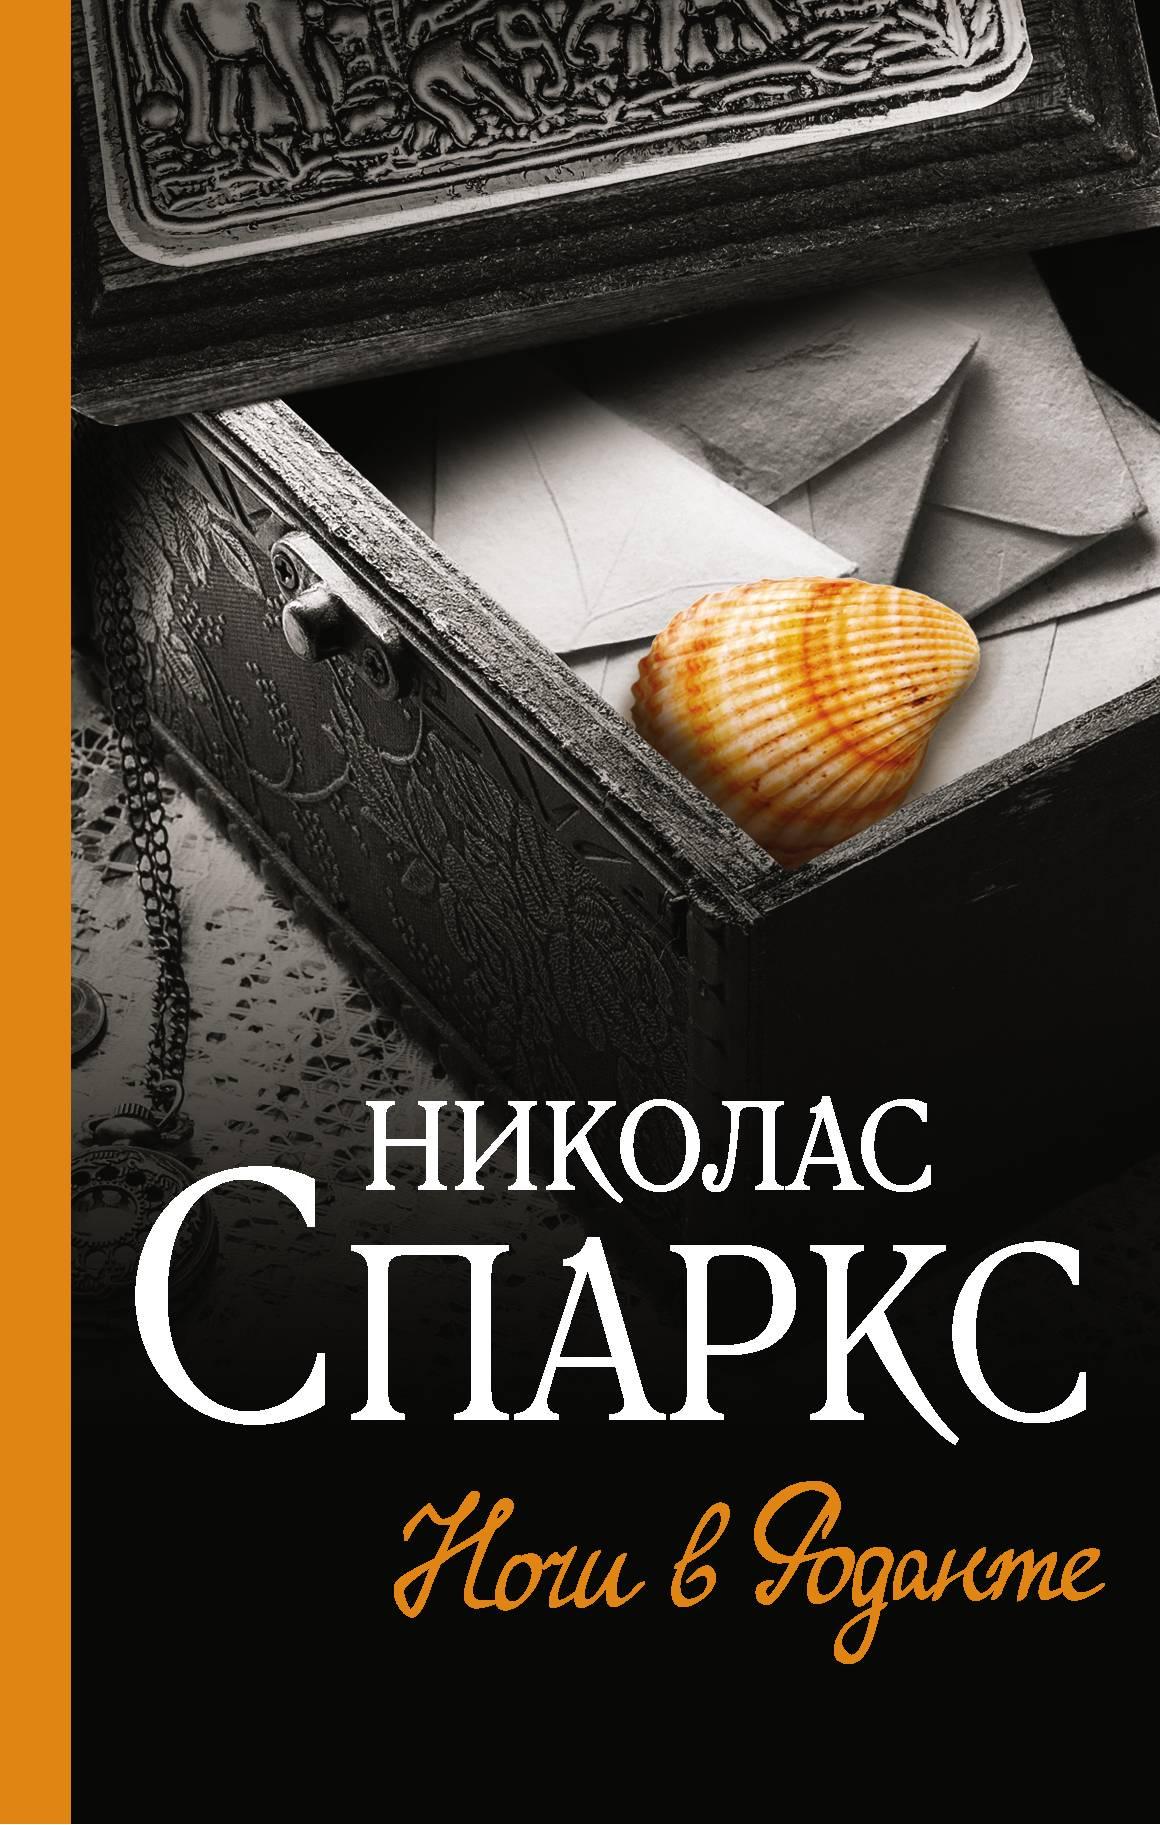 Николас Спаркс Ночи в Роданте джиган – дни и ночи cd